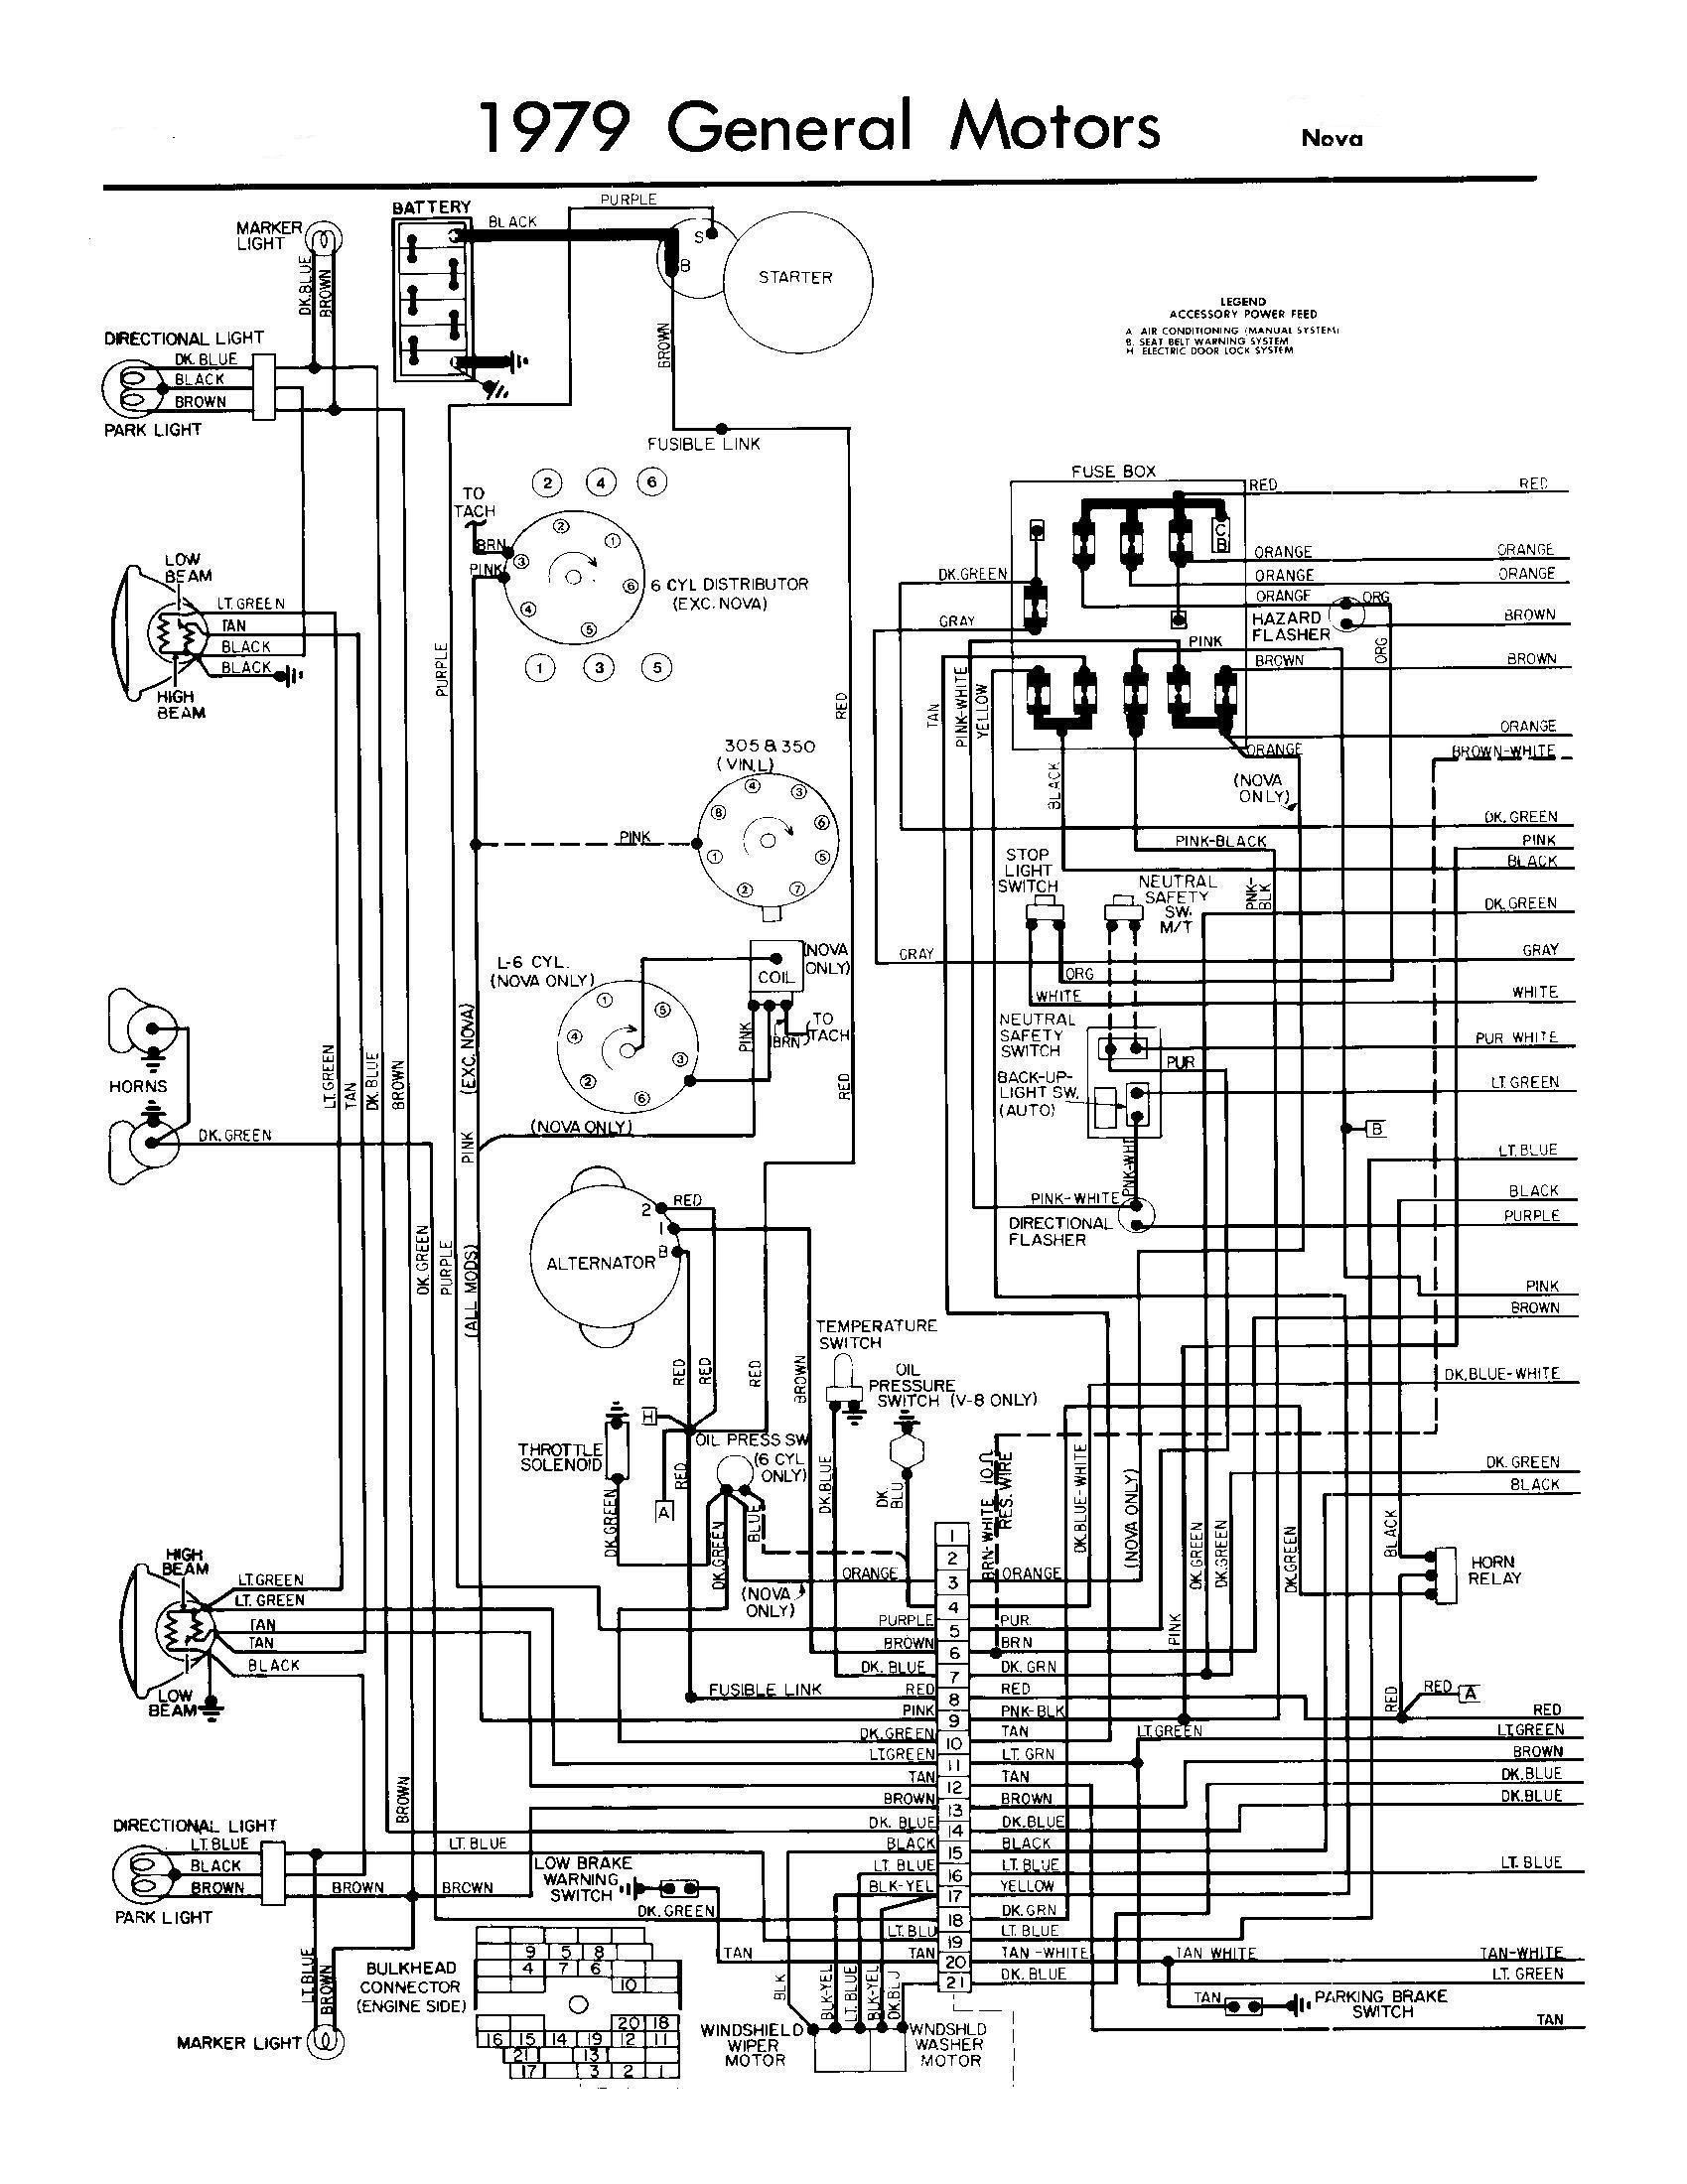 Volvo Truck Wiring Diagrams All Generation Wiring Schematics Chevy Nova forum Of Volvo Truck Wiring Diagrams